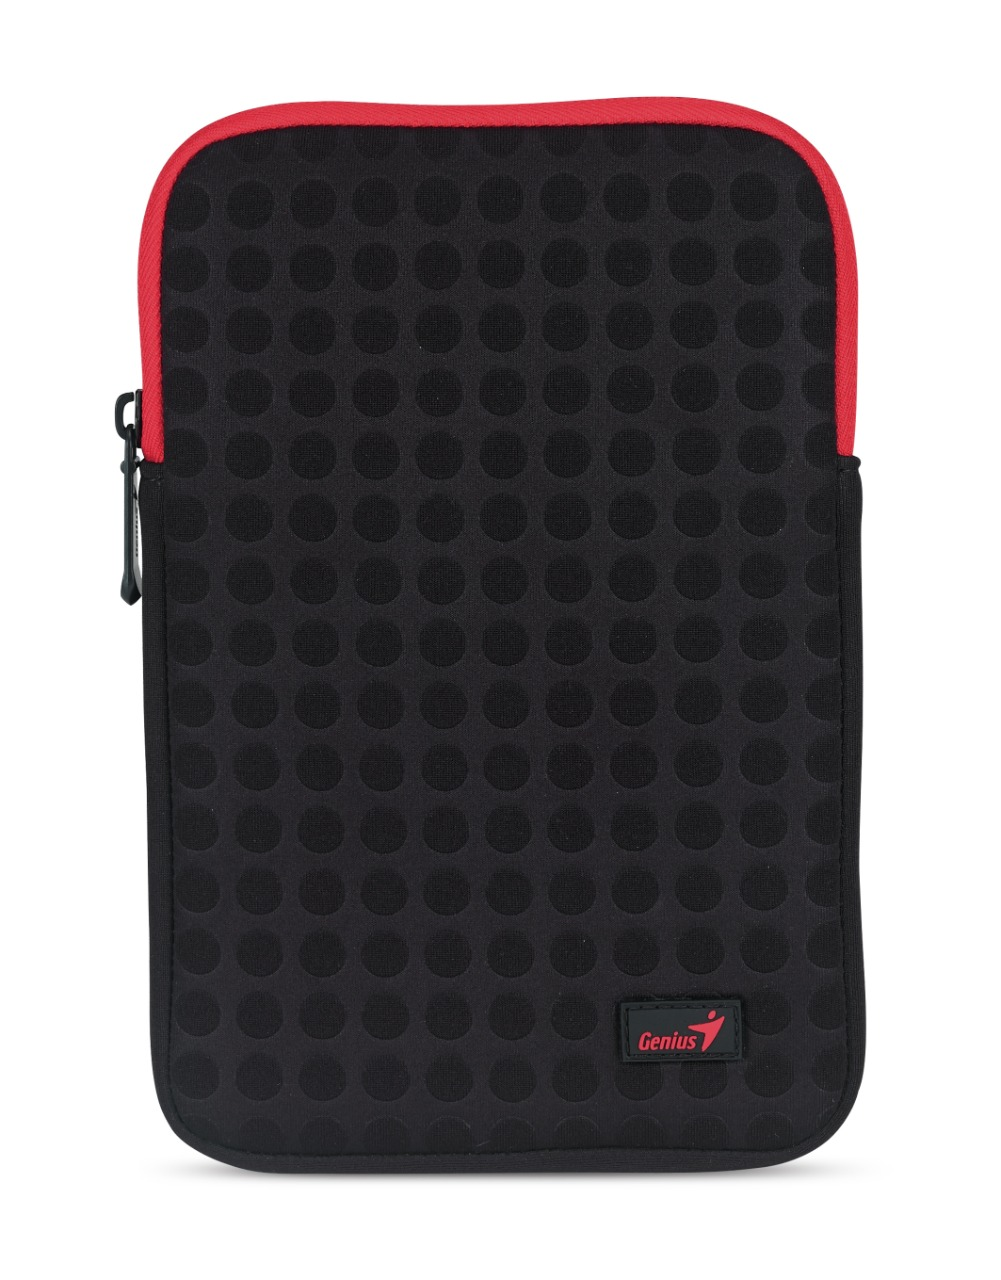 Wholesale sleeve bag : gs-1021 polyester bag black red